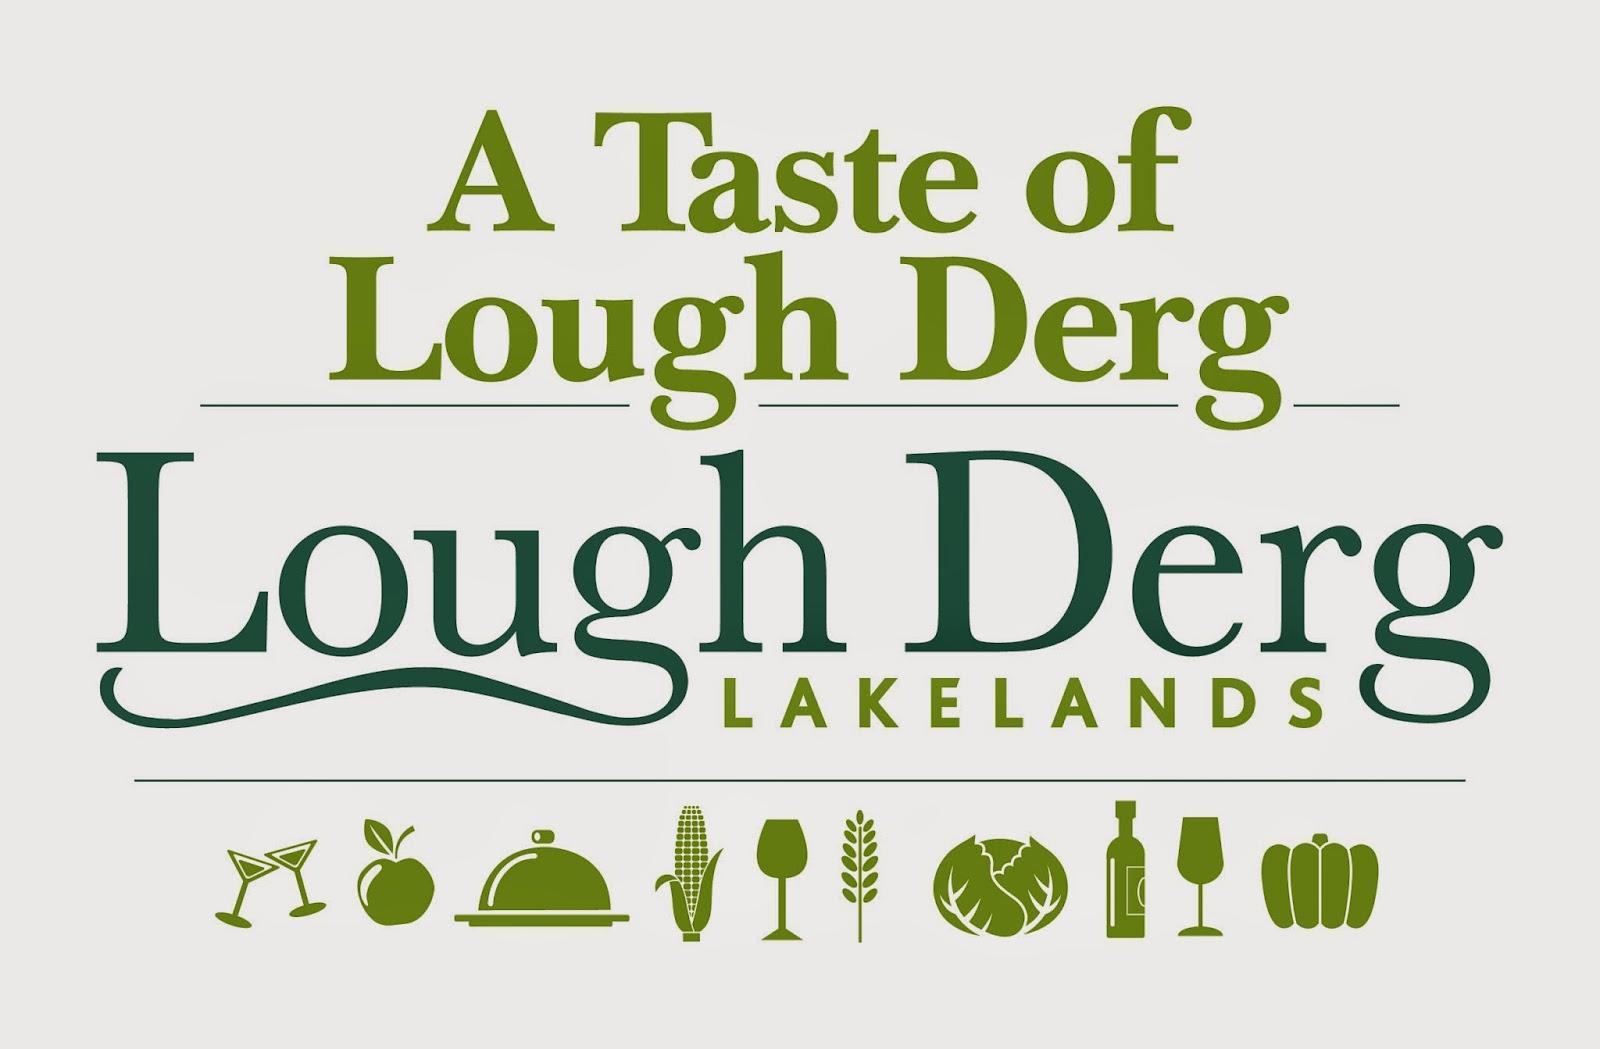 New series provides 'A Taste of Lough Derg'